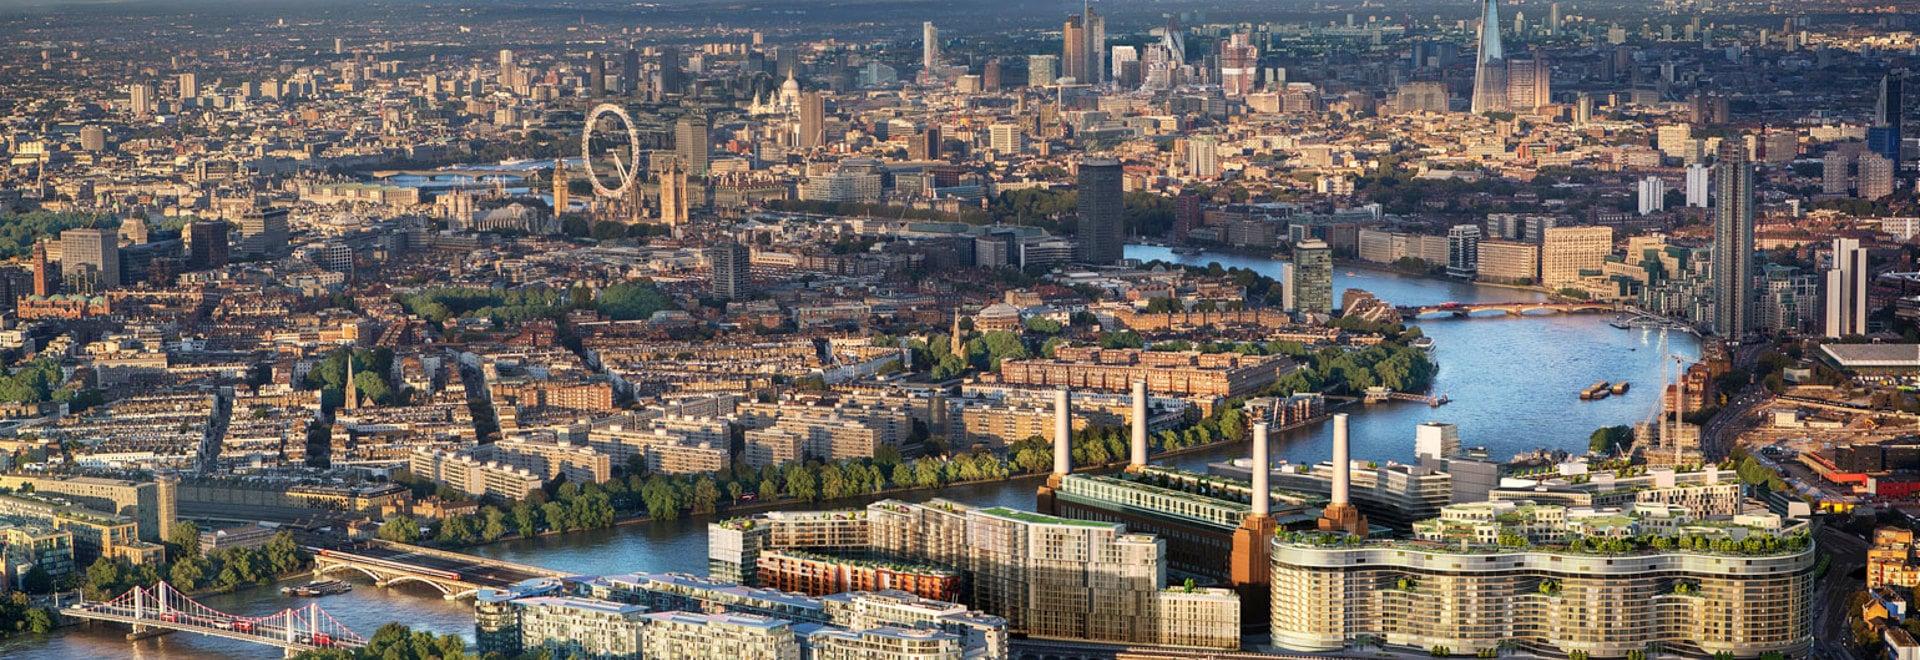 London's latest crop of residential developments